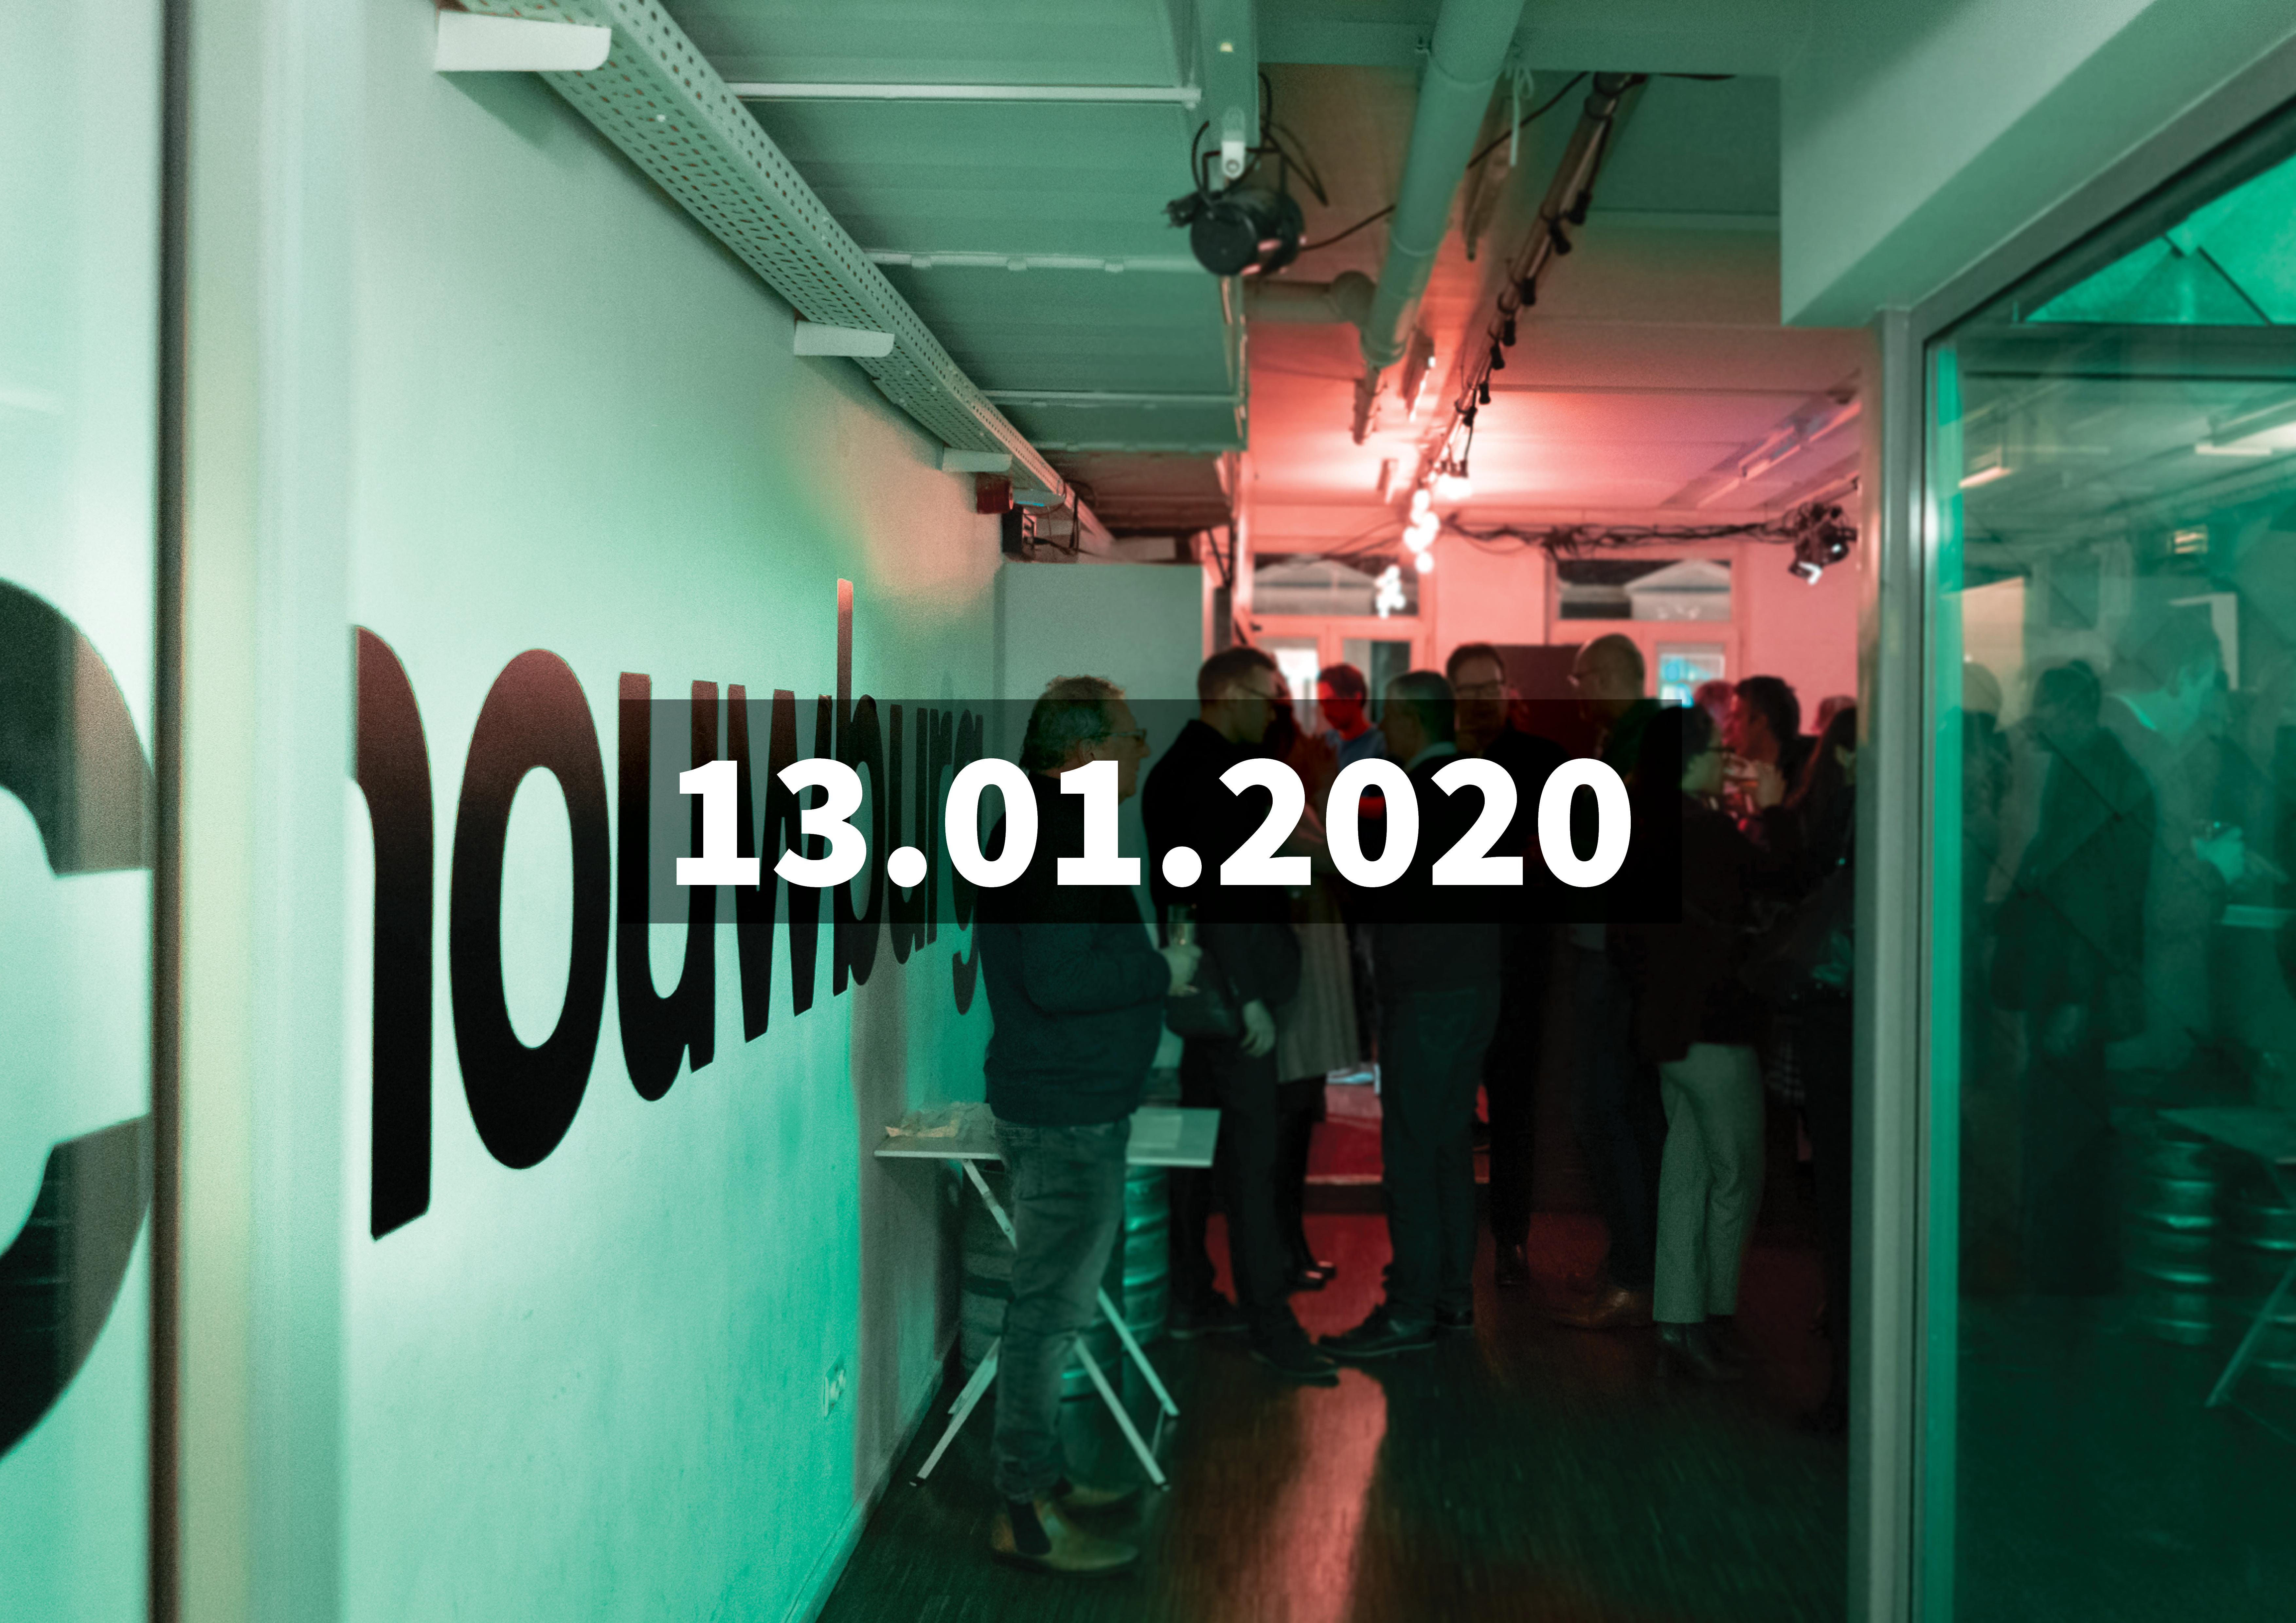 PlayRight Nieuwjaarsdrink 2020 – Maandag 13 januari